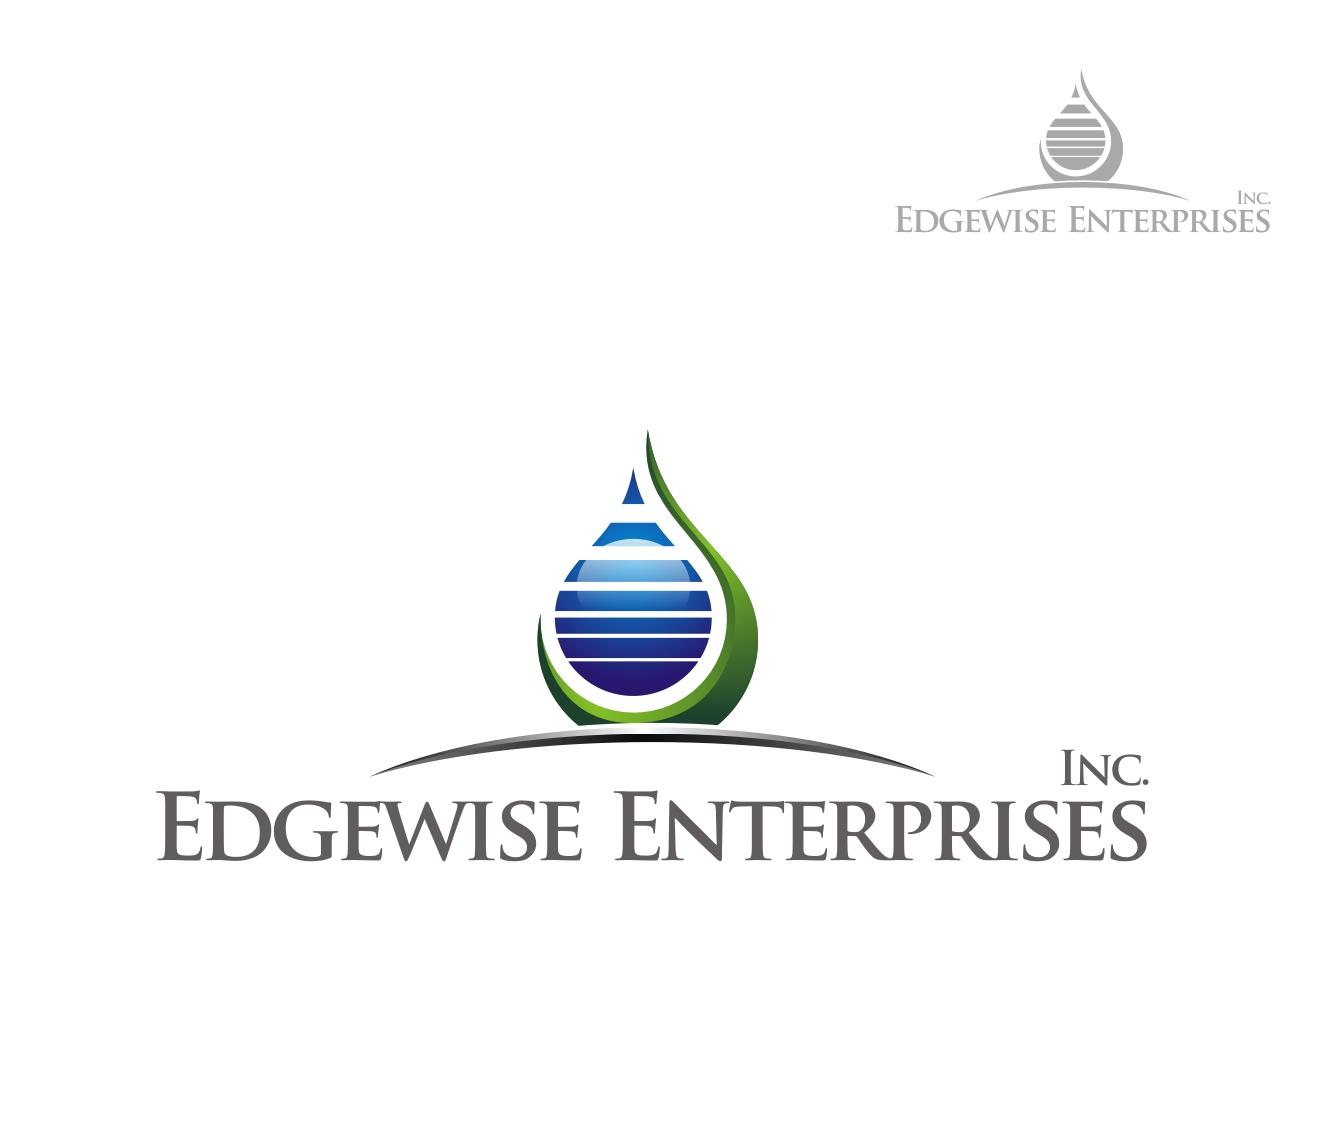 Logo Design by Reivan Ferdinan - Entry No. 80 in the Logo Design Contest New Logo Design for Edgewise Enterprises Inc..